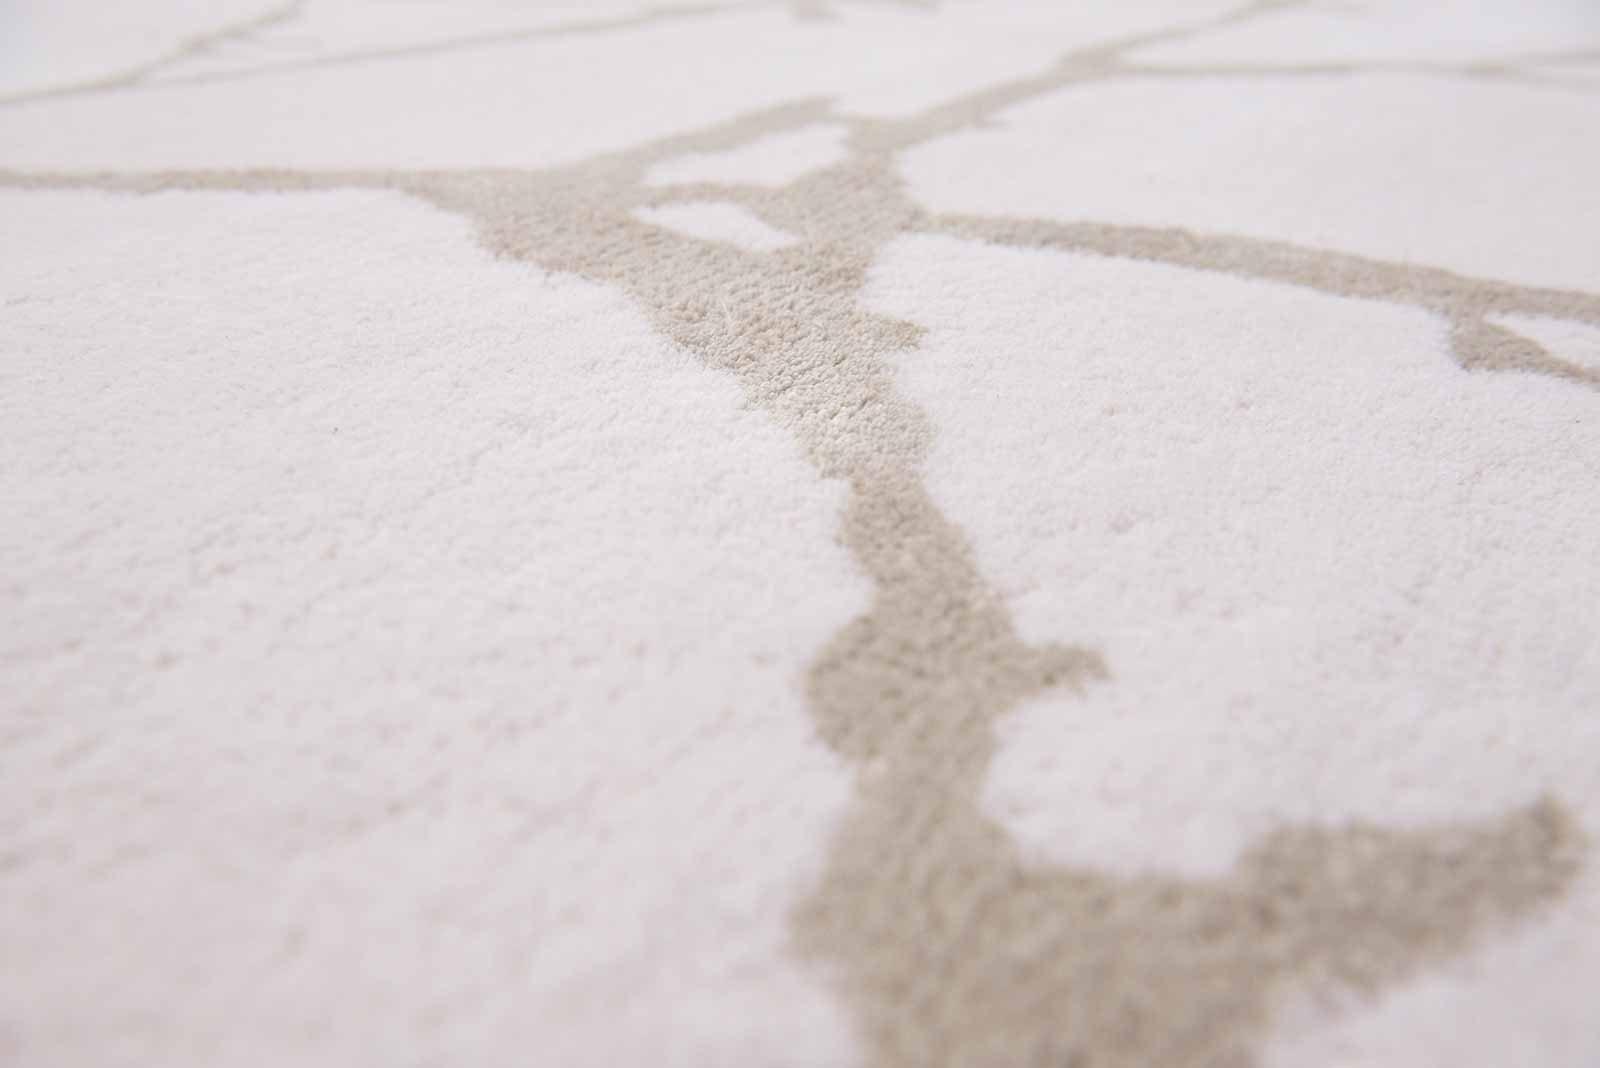 Louis De Poortere tapijt Romo LX 2009 Acacia Crema zoom 3